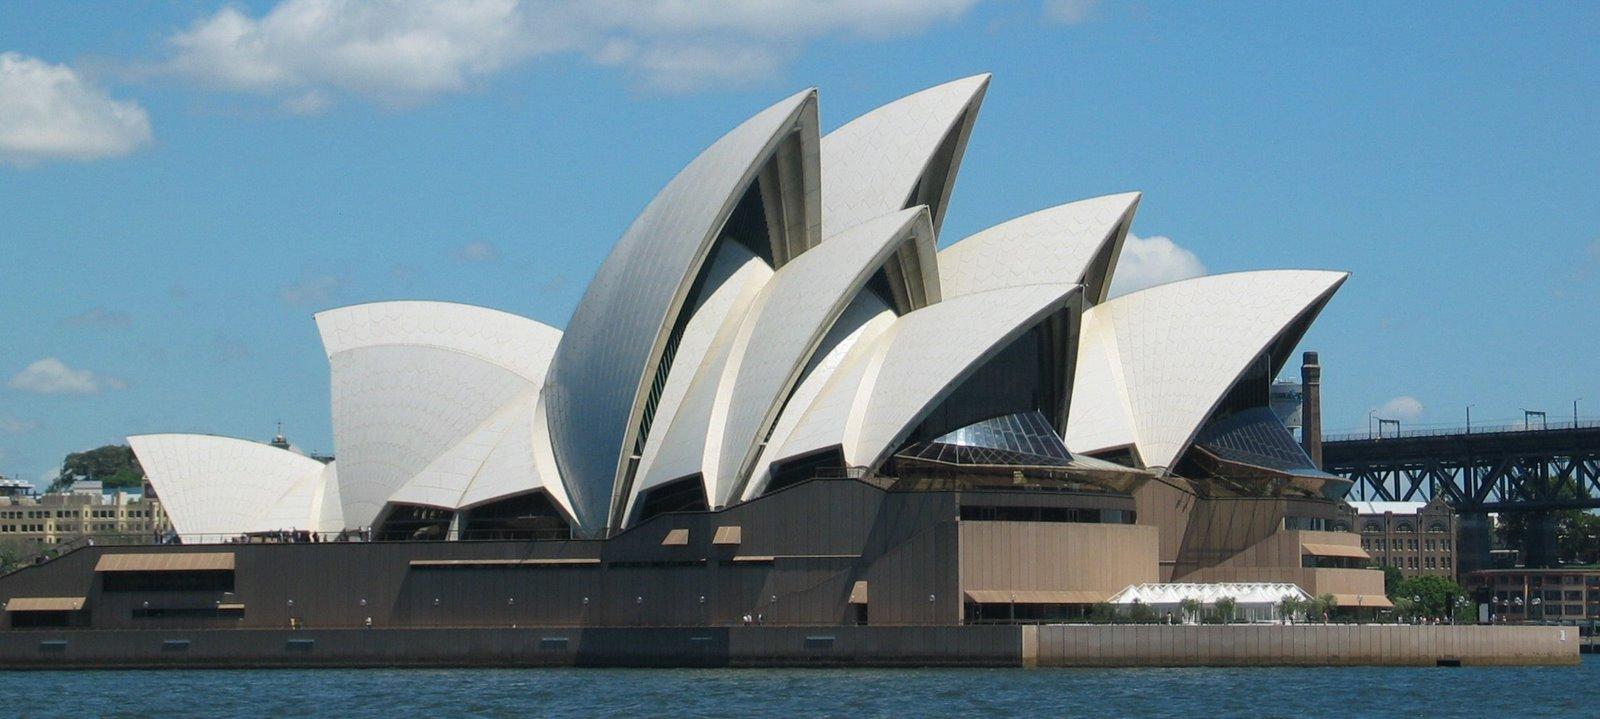 SydneyOperaHouse-756409